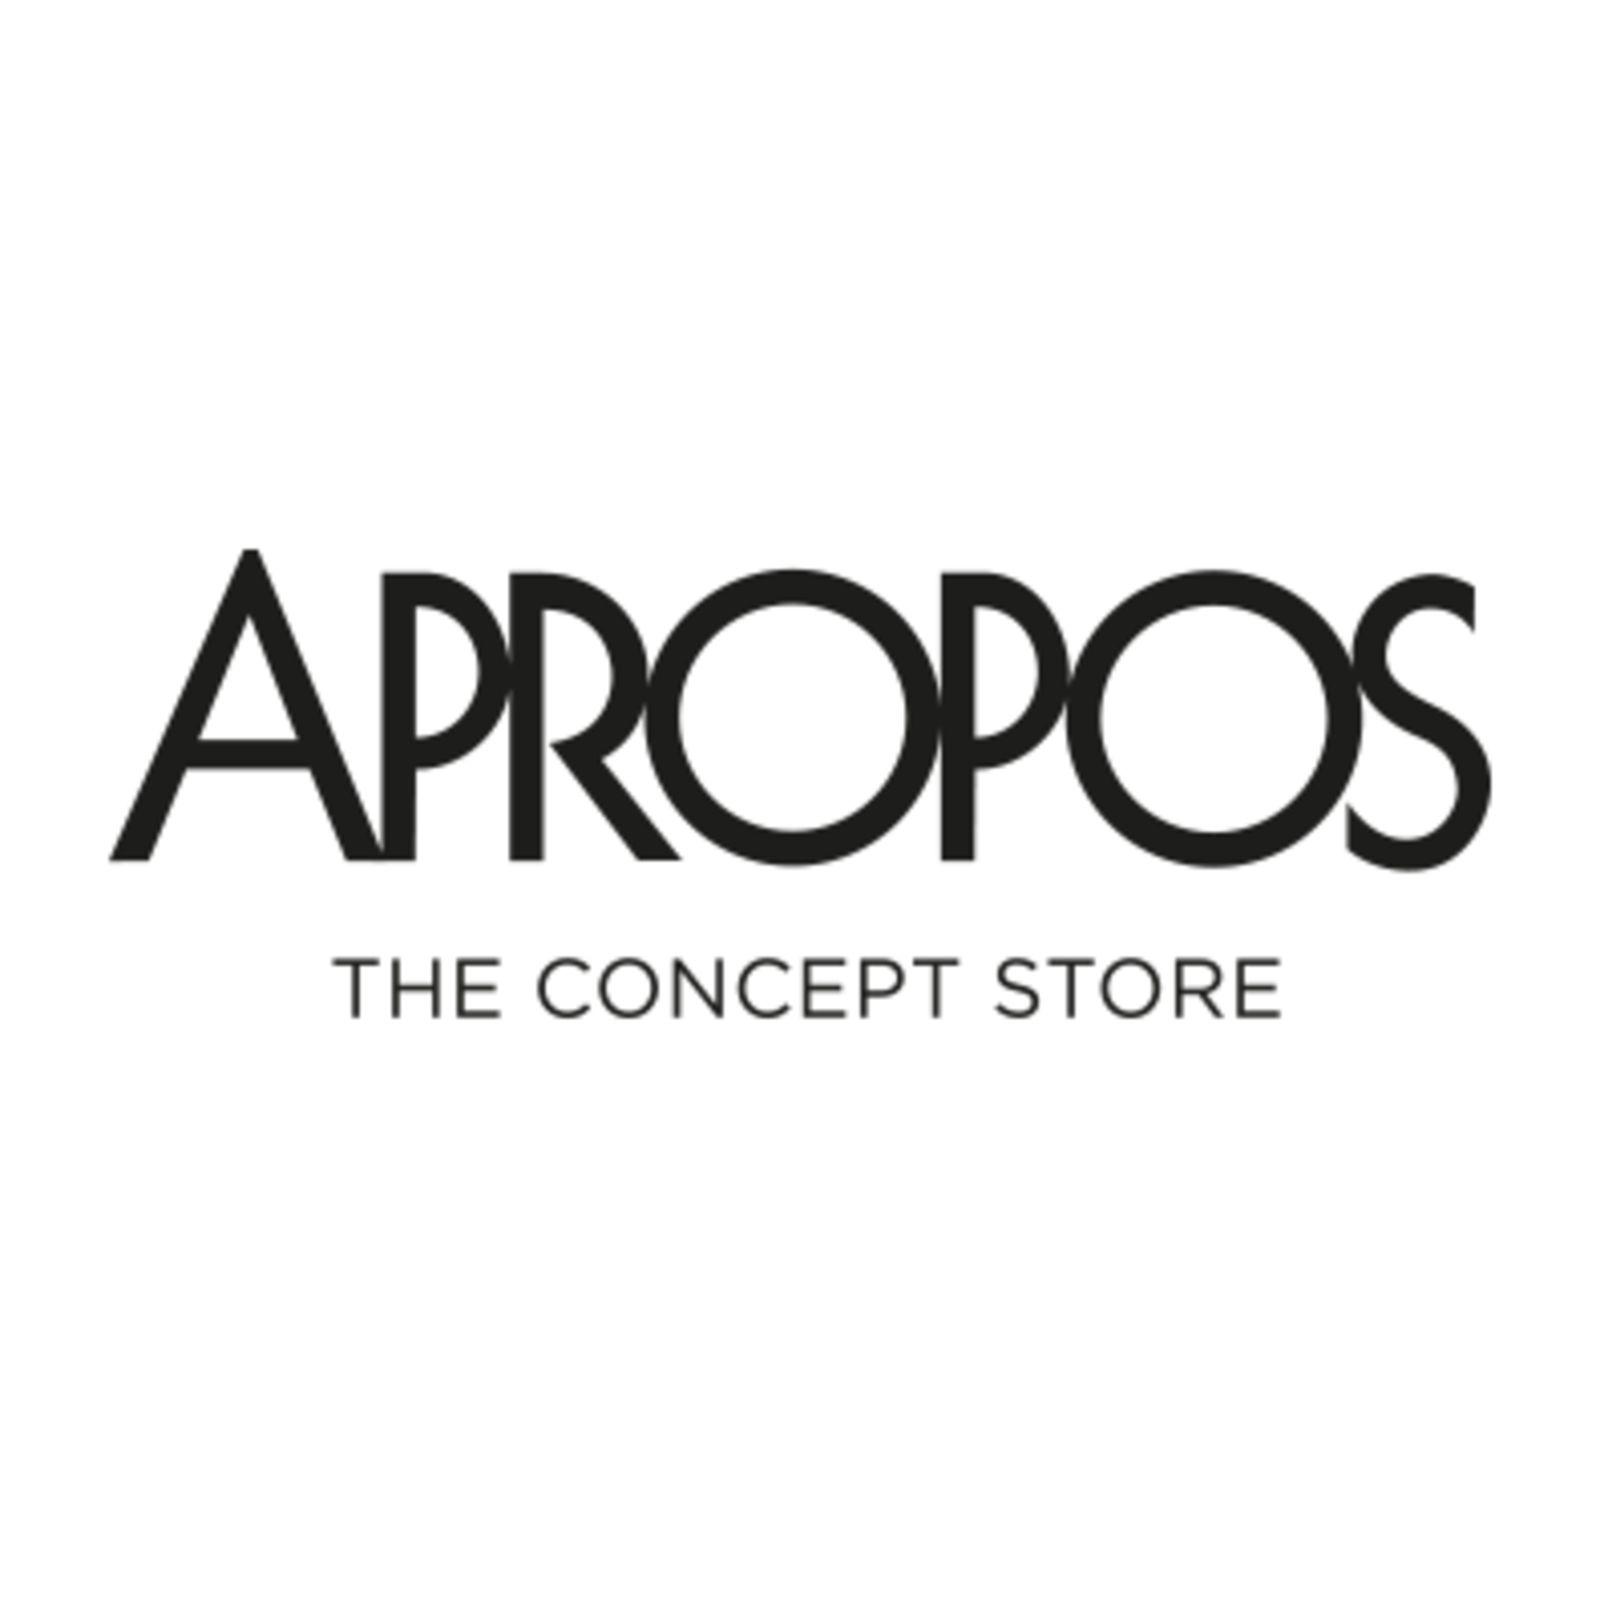 APROPOS The Concept Store in Düsseldorf (Bild 2)